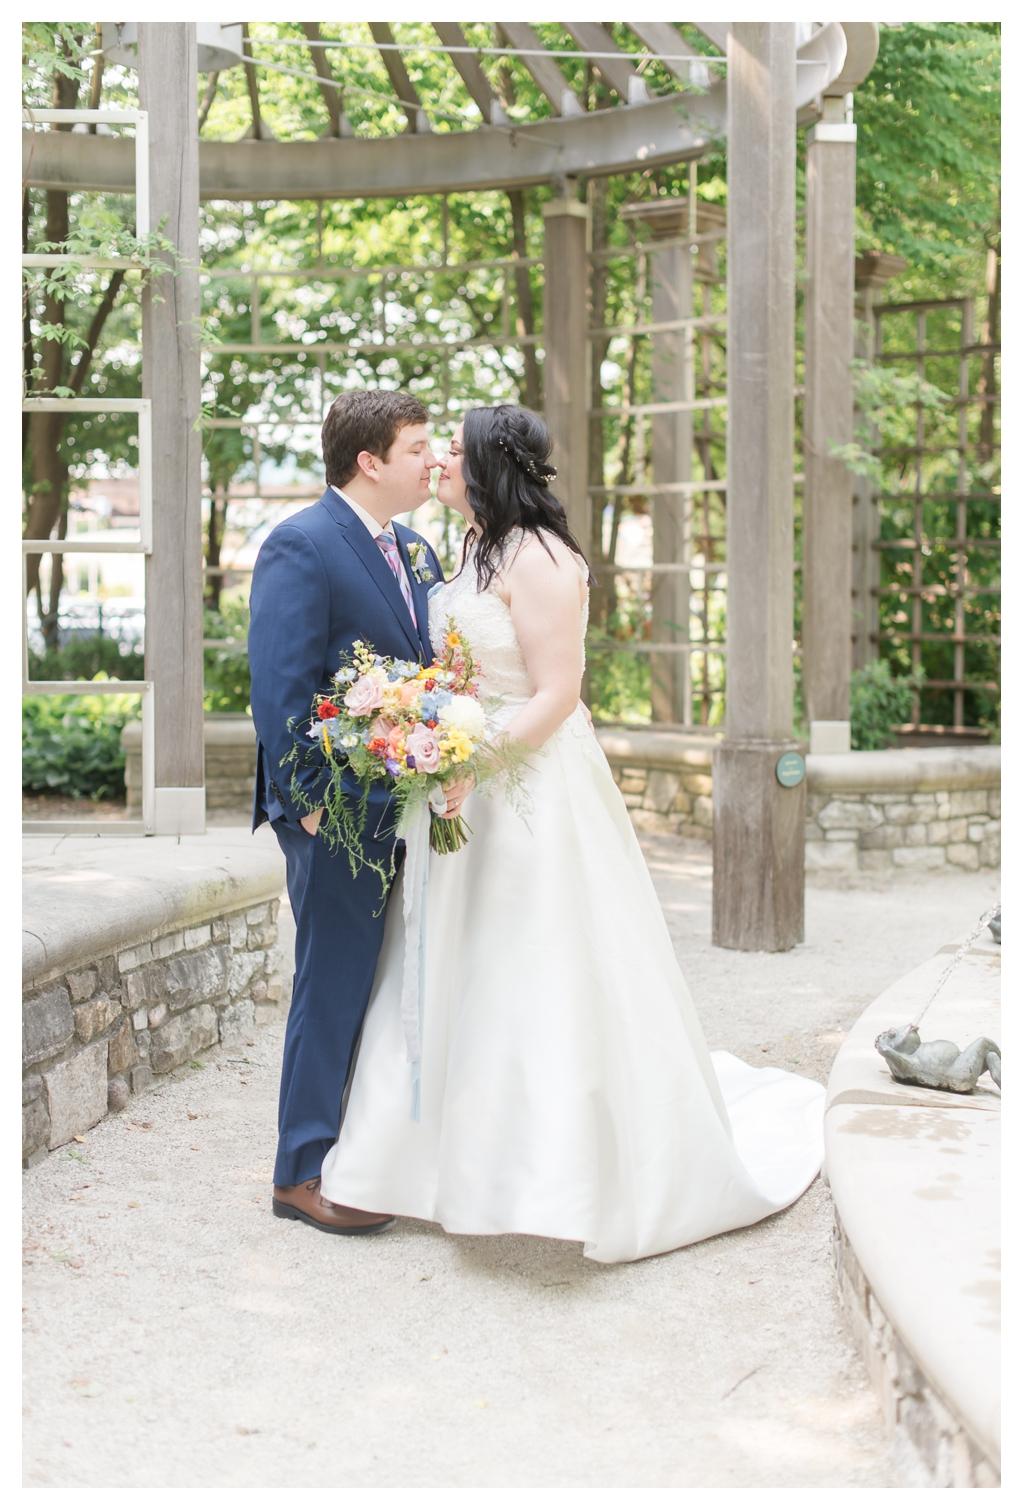 Indianapolis Zoo Butterfly Garden Wedding Ceremony_0719.jpg